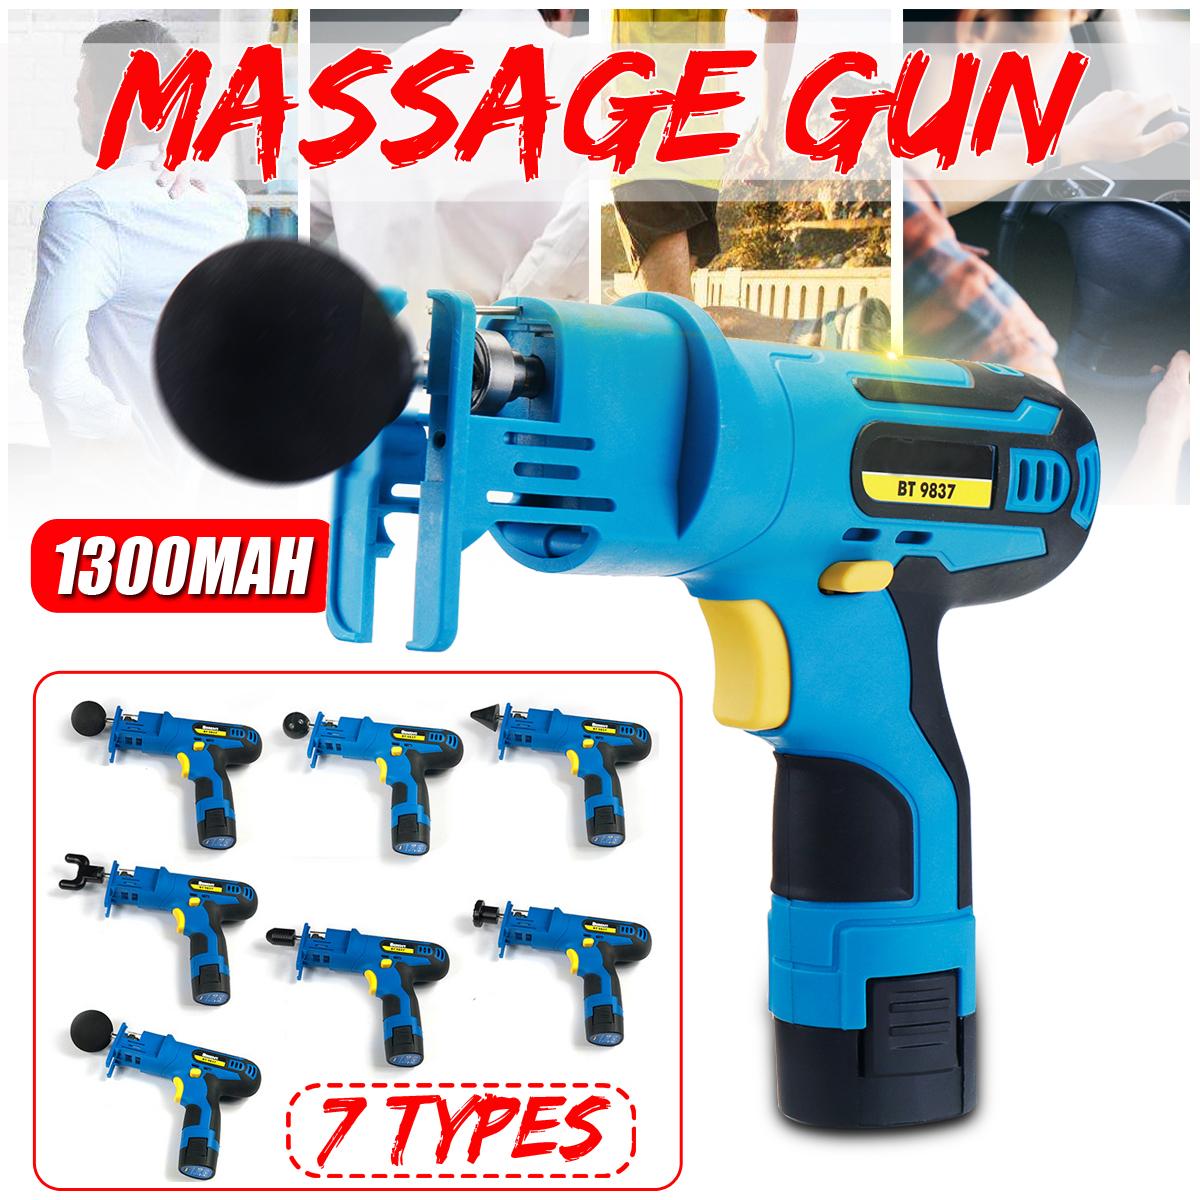 1300mAh Percussion Massage Therapy Vibrating Deep Tissue